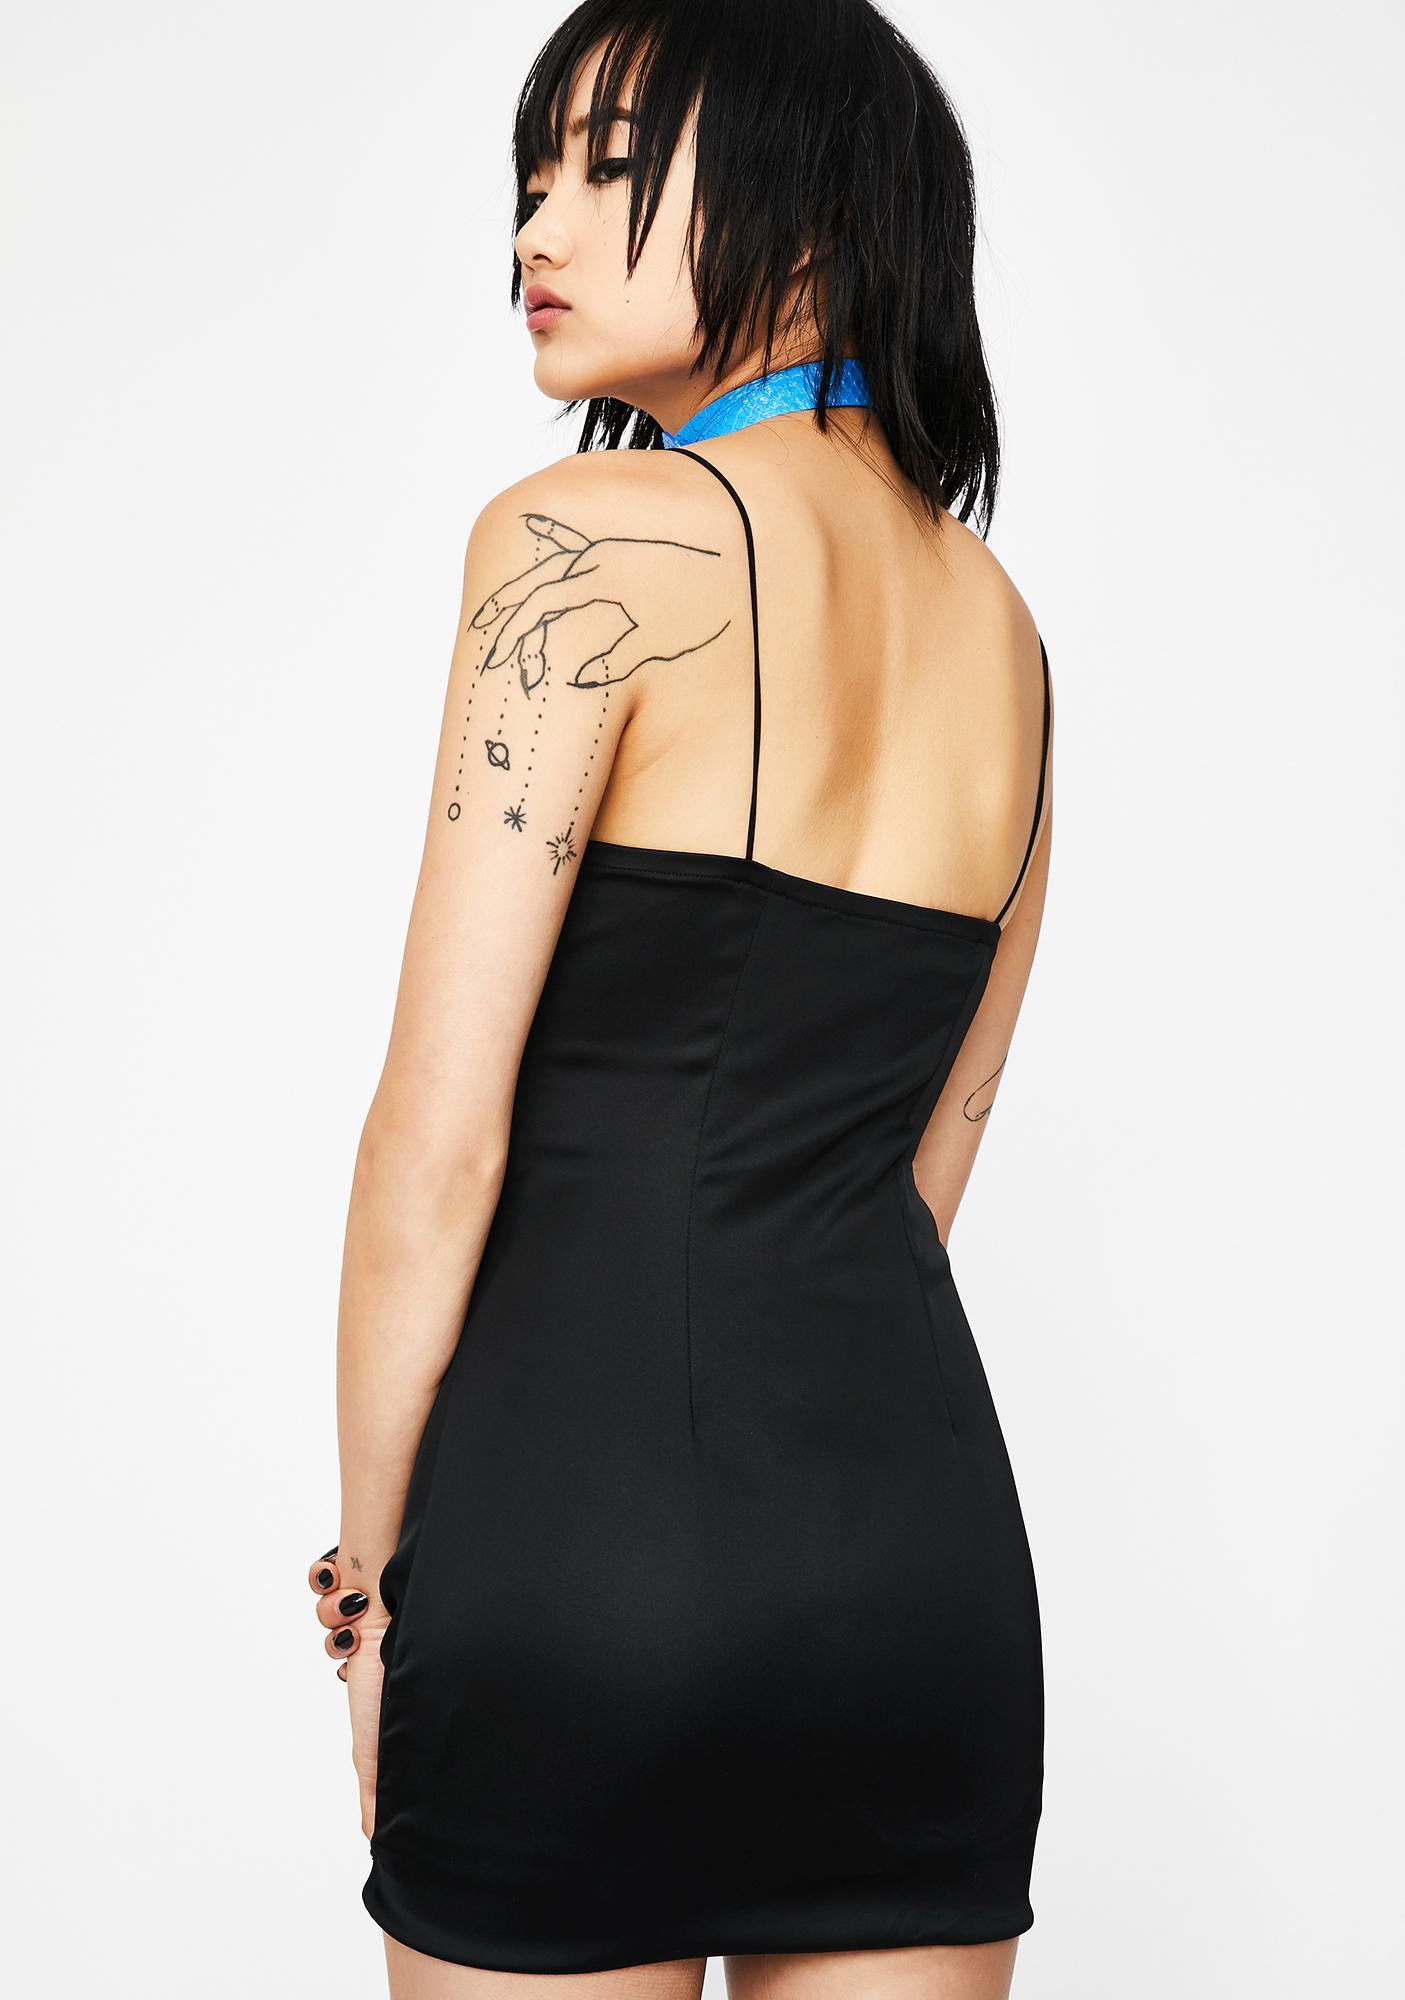 Current Mood Grace Evolution Butterfly Dress